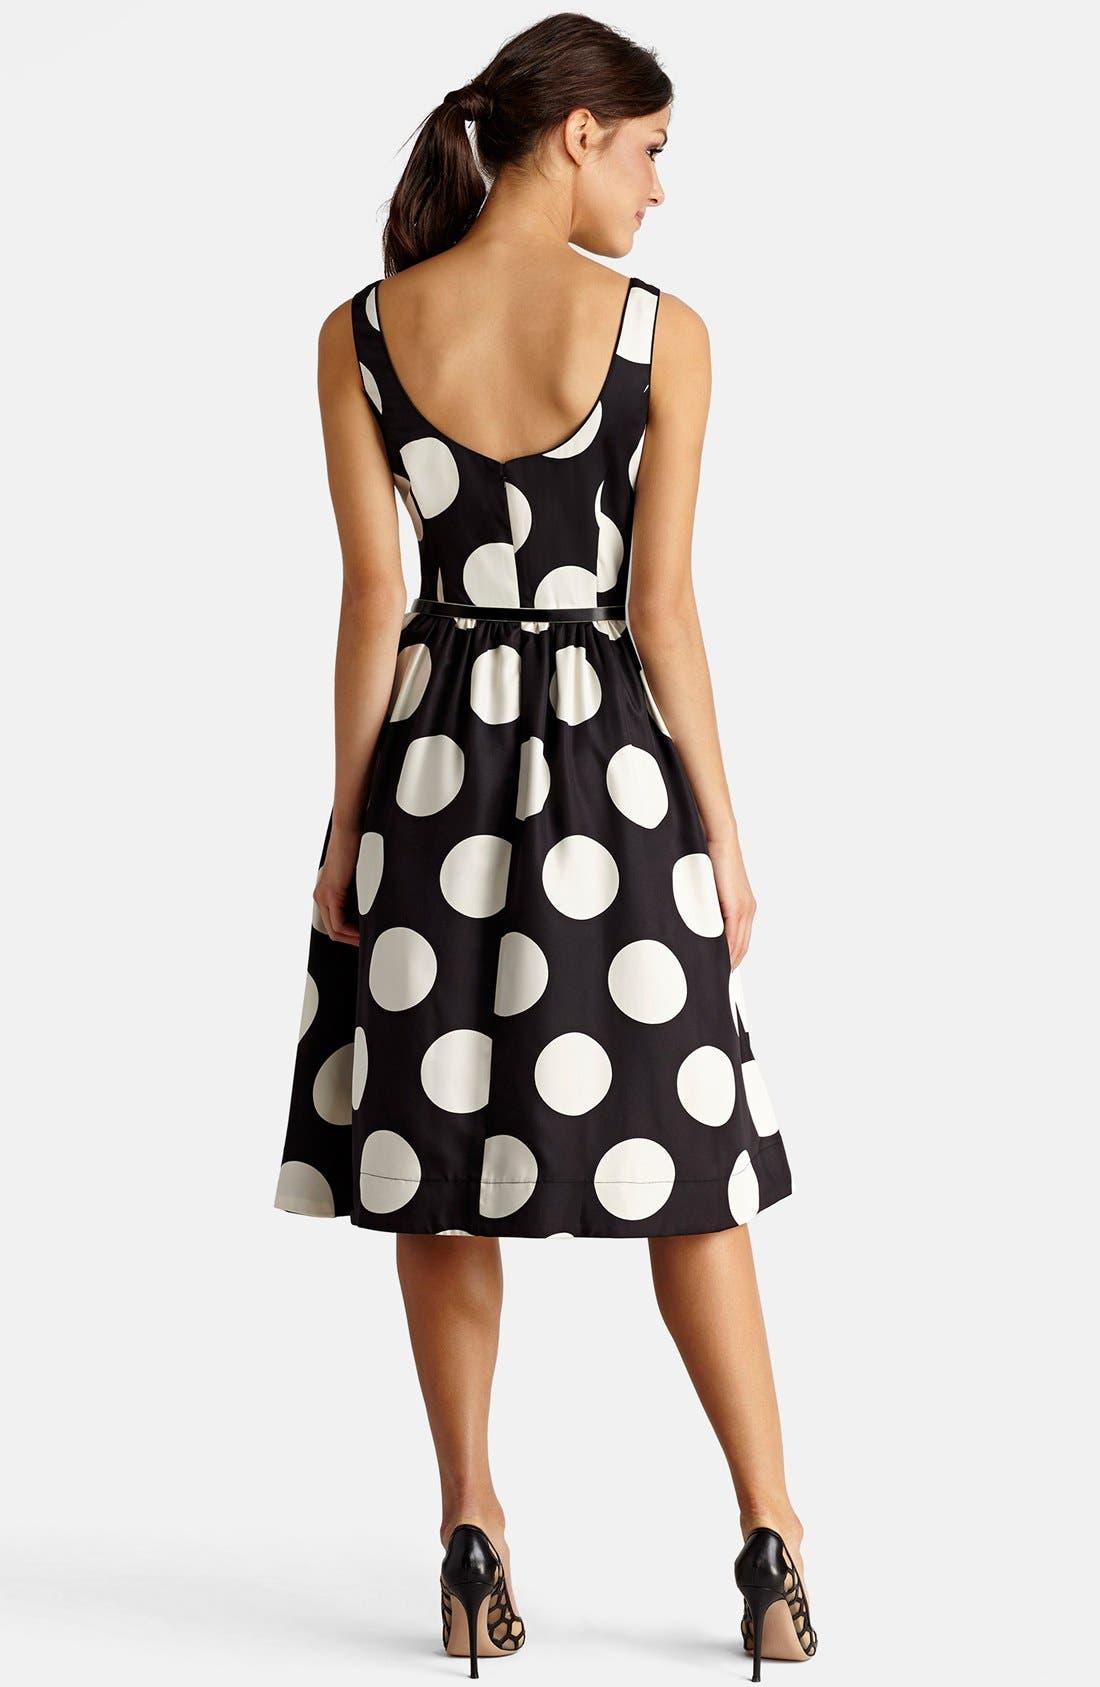 DONNA MORGAN, Polka Dot Fit & Flare Midi Dress, Alternate thumbnail 2, color, 009